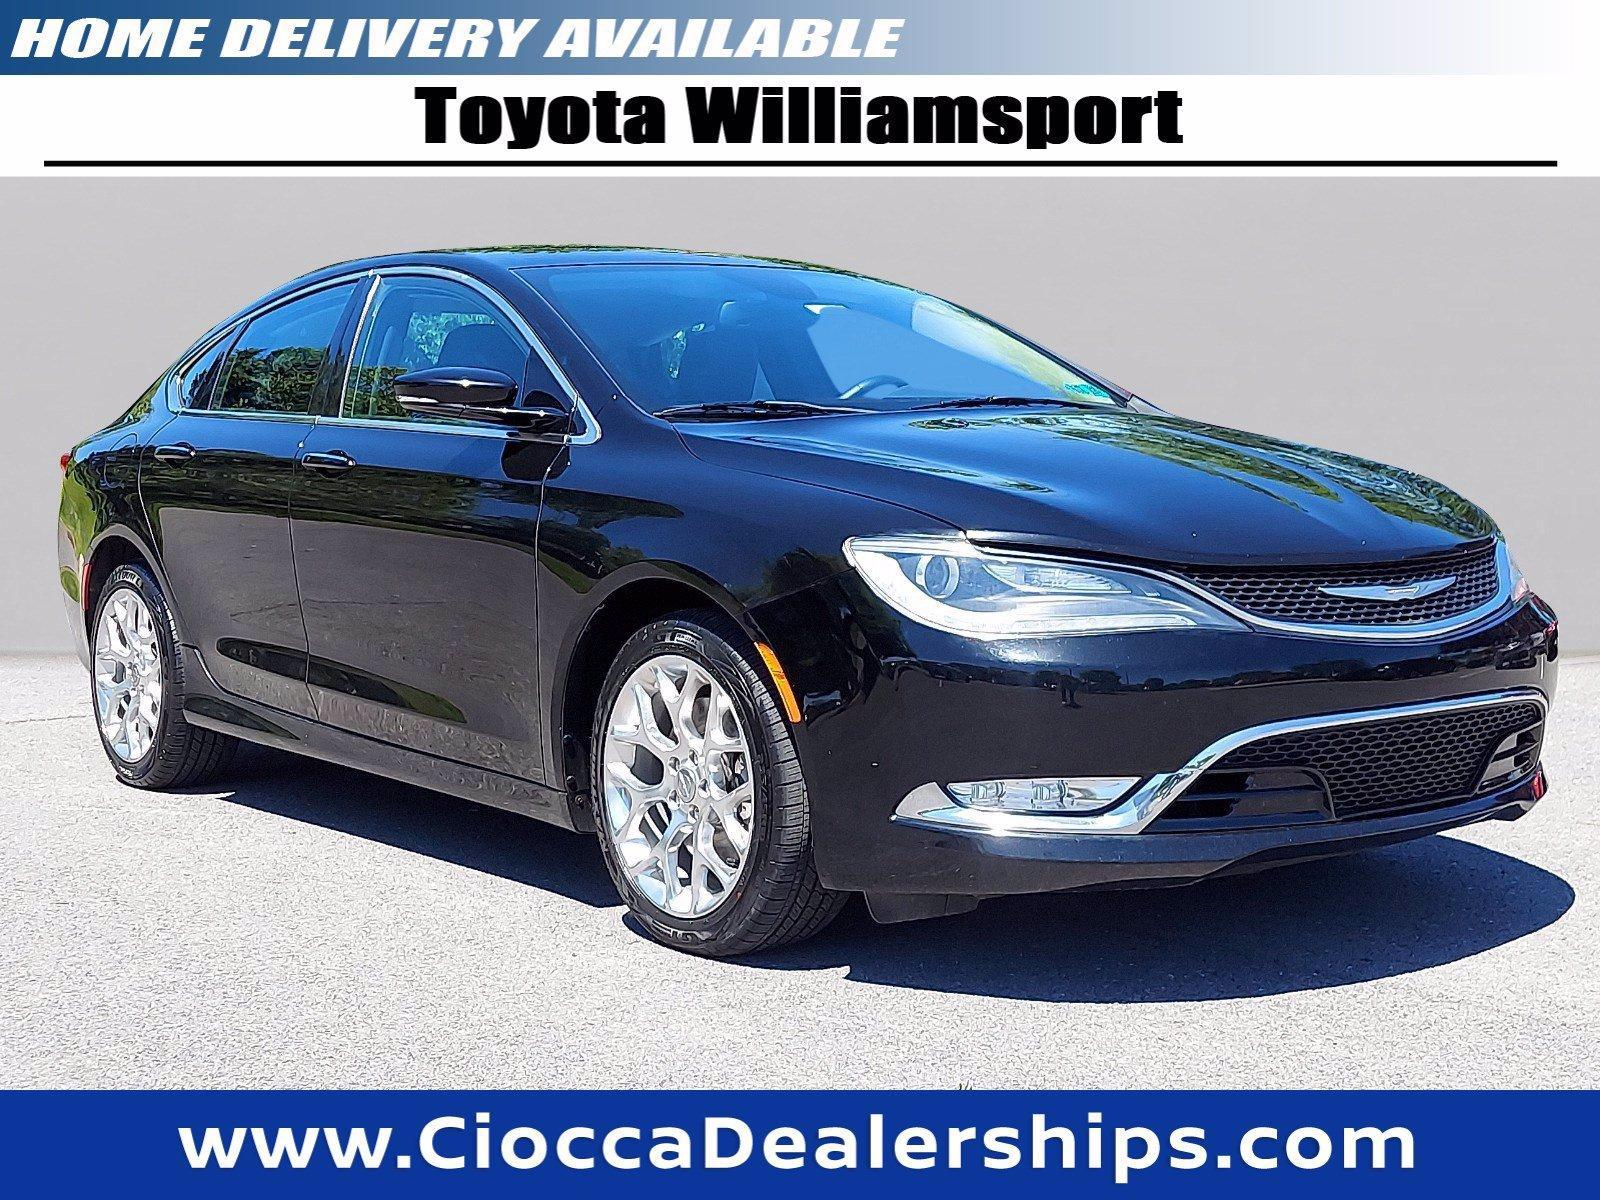 2015 Chrysler 200 Vehicle Photo in Muncy, PA 17756